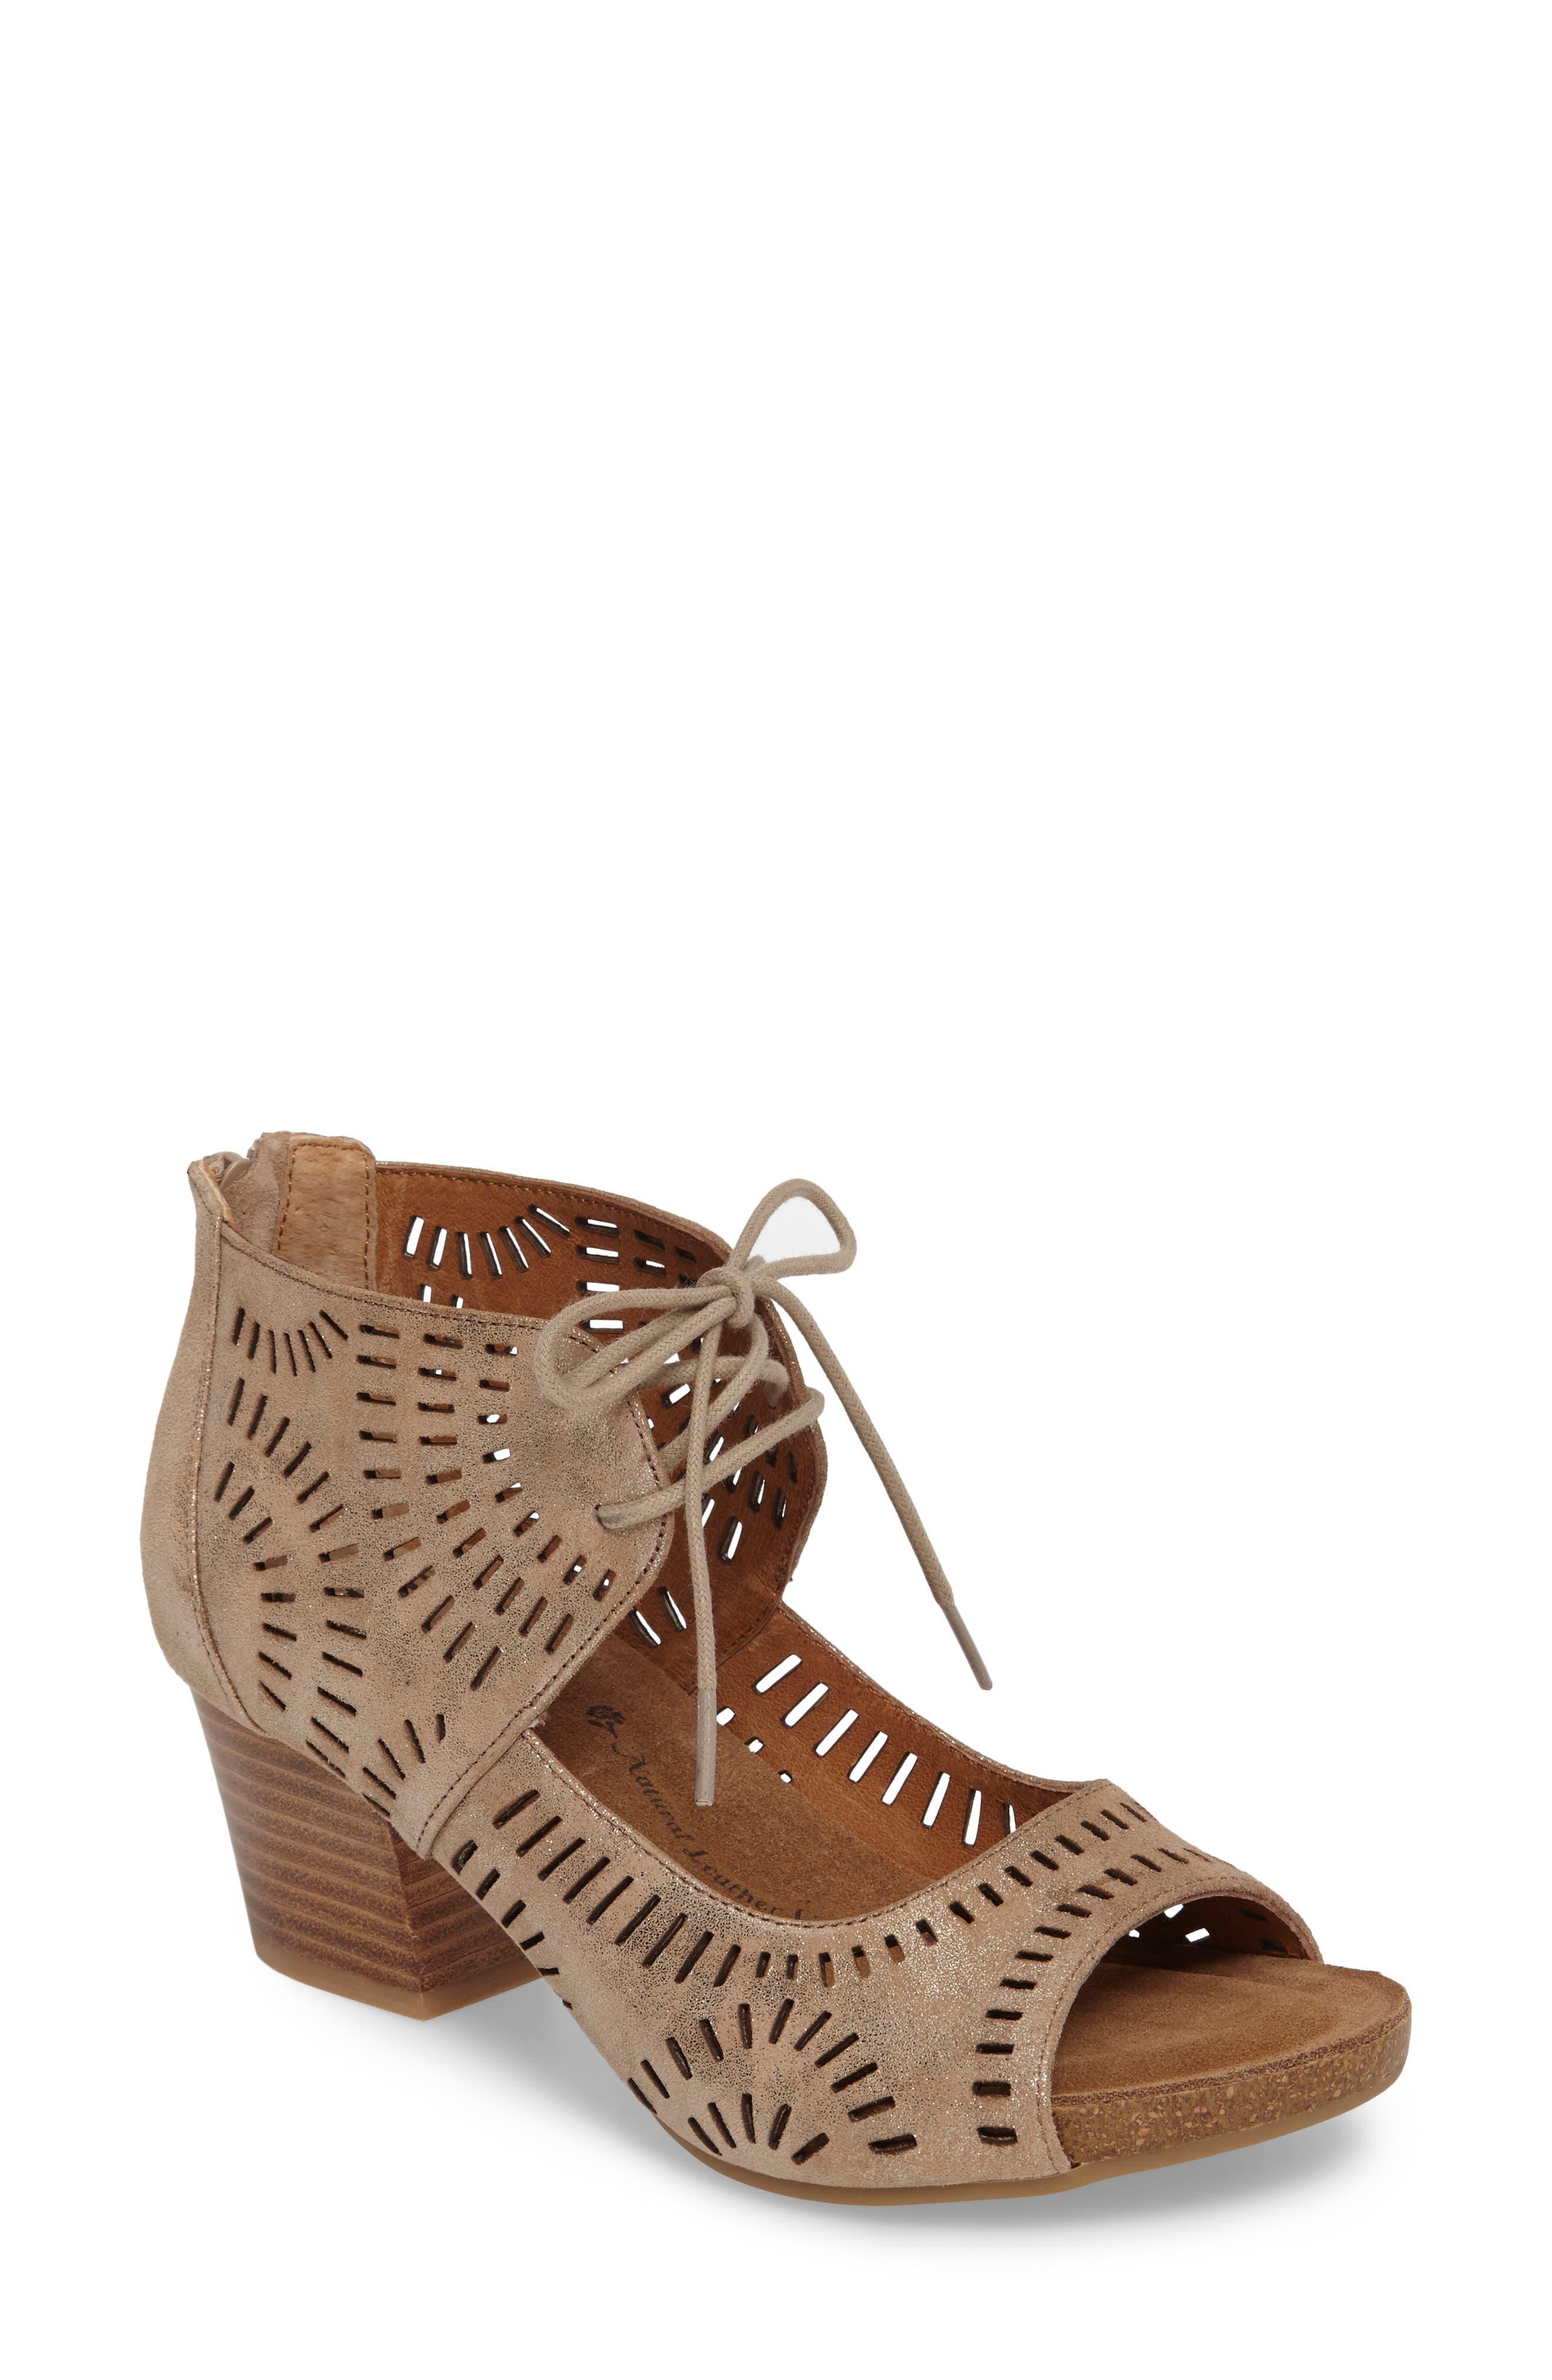 Sofft Modesto Perforated Sandal- Metallic